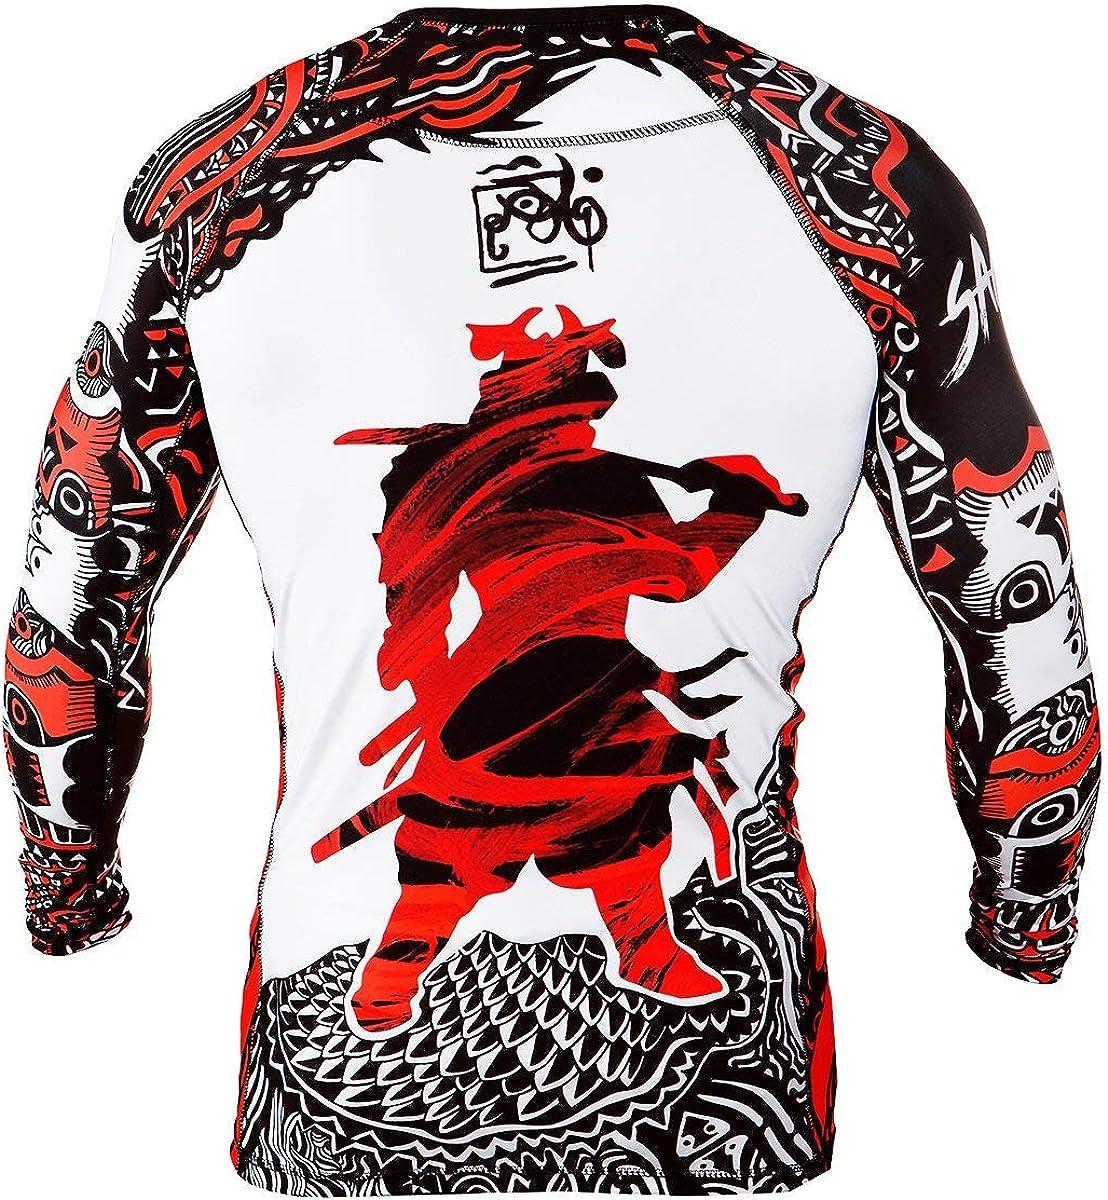 Training Samurai Running MMA Fightwear Compression Top Sportswear Rule Out Long Sleeve Rash Guard Top Cycling Gym